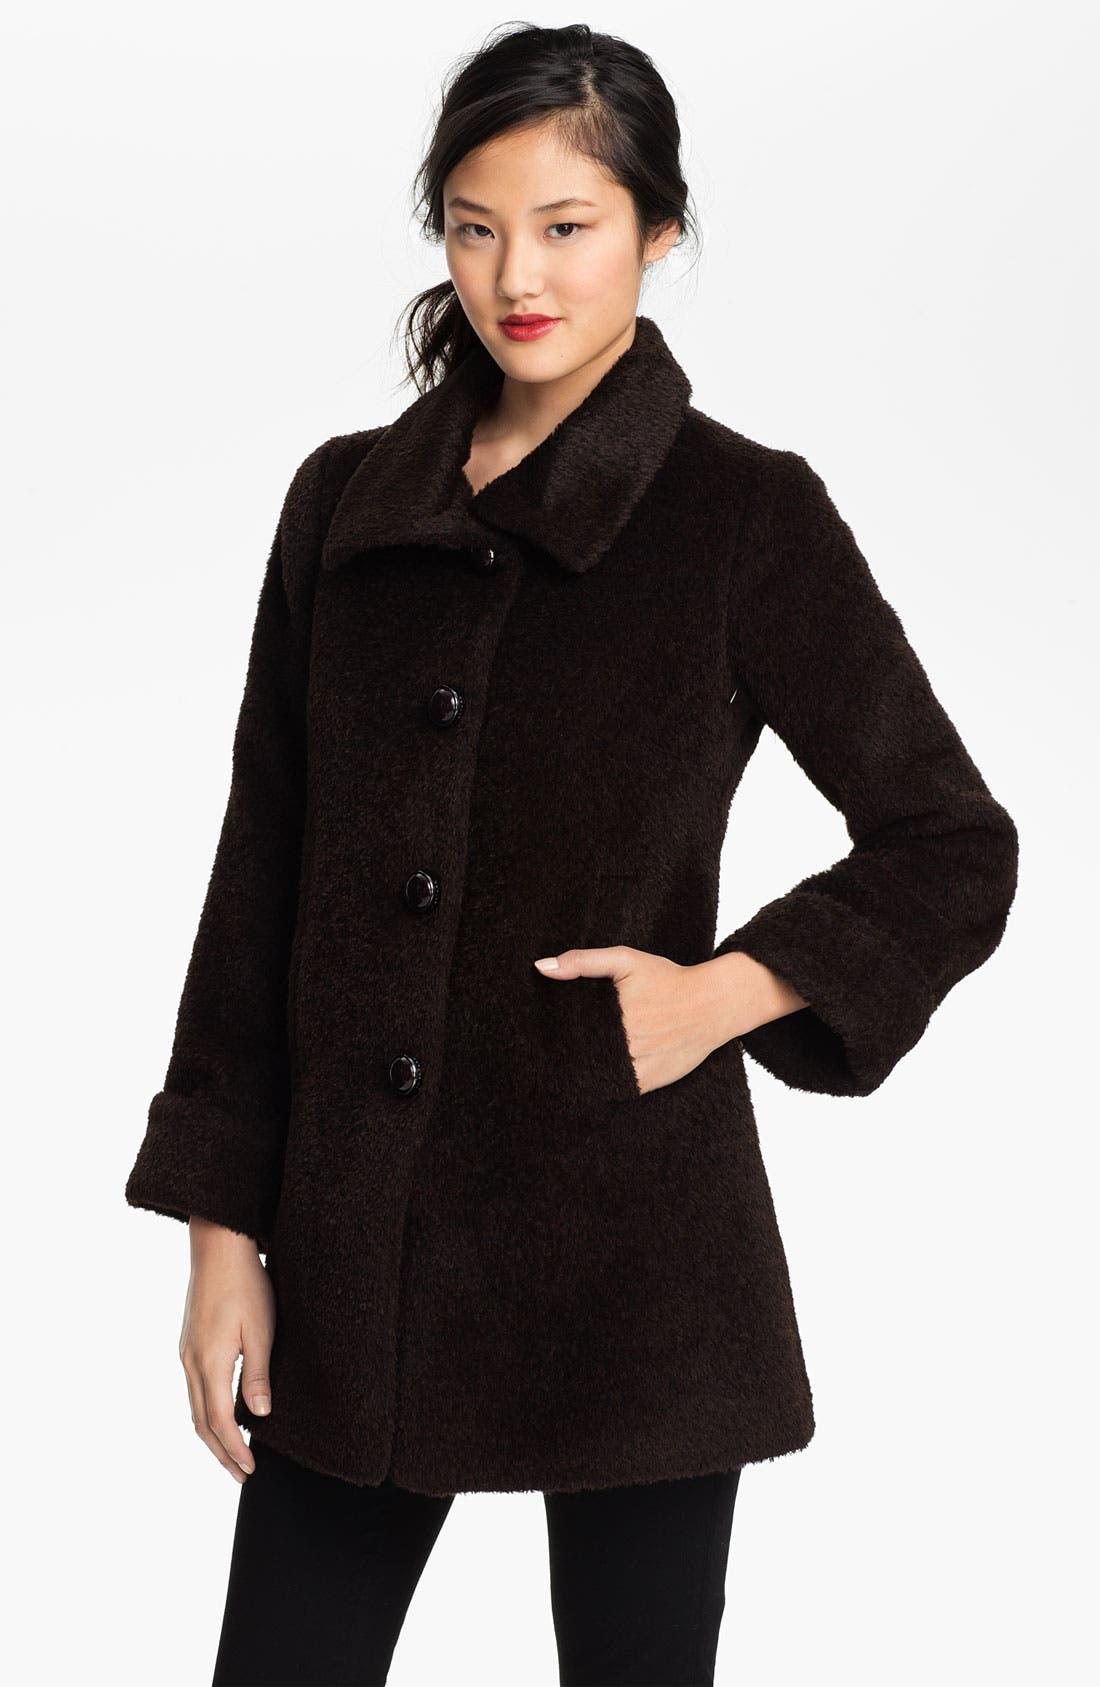 Alternate Image 1 Selected - Trina Turk Alpaca Blend Coat (Petite)